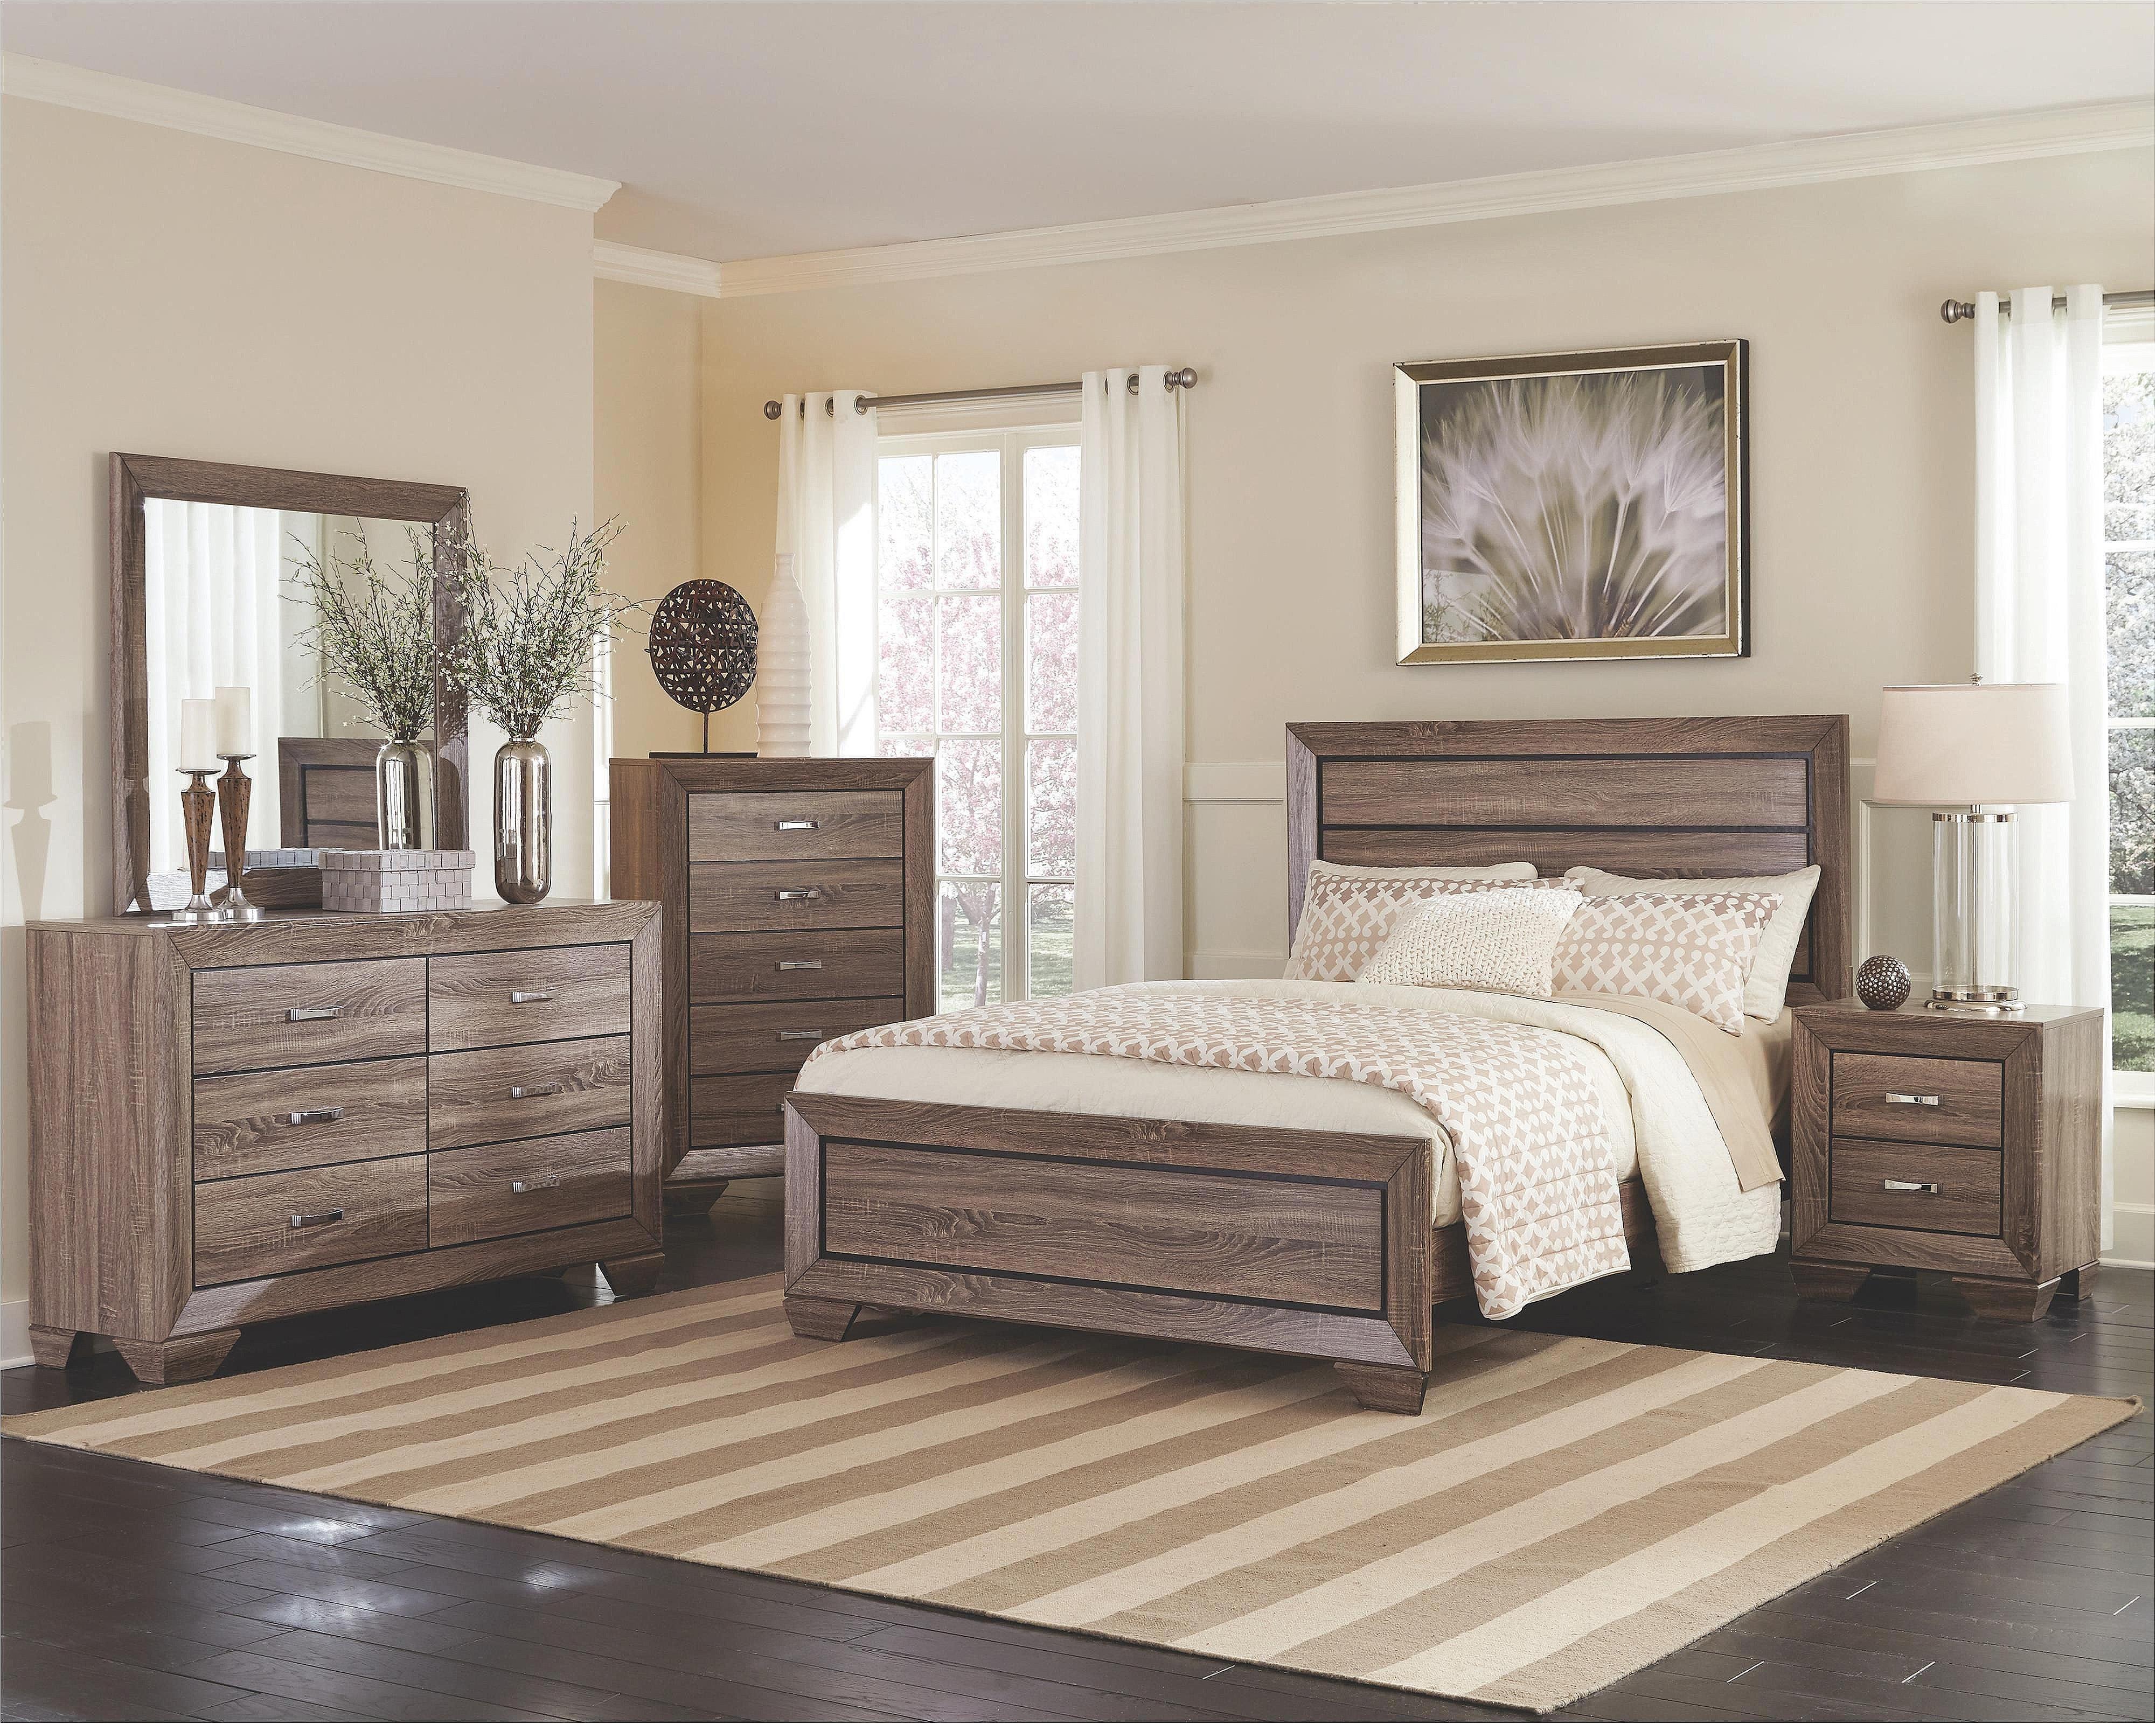 Elegant Twin Bedroom Sets Bedroom Furniture Sets Bedroom Set King Bedroom Sets